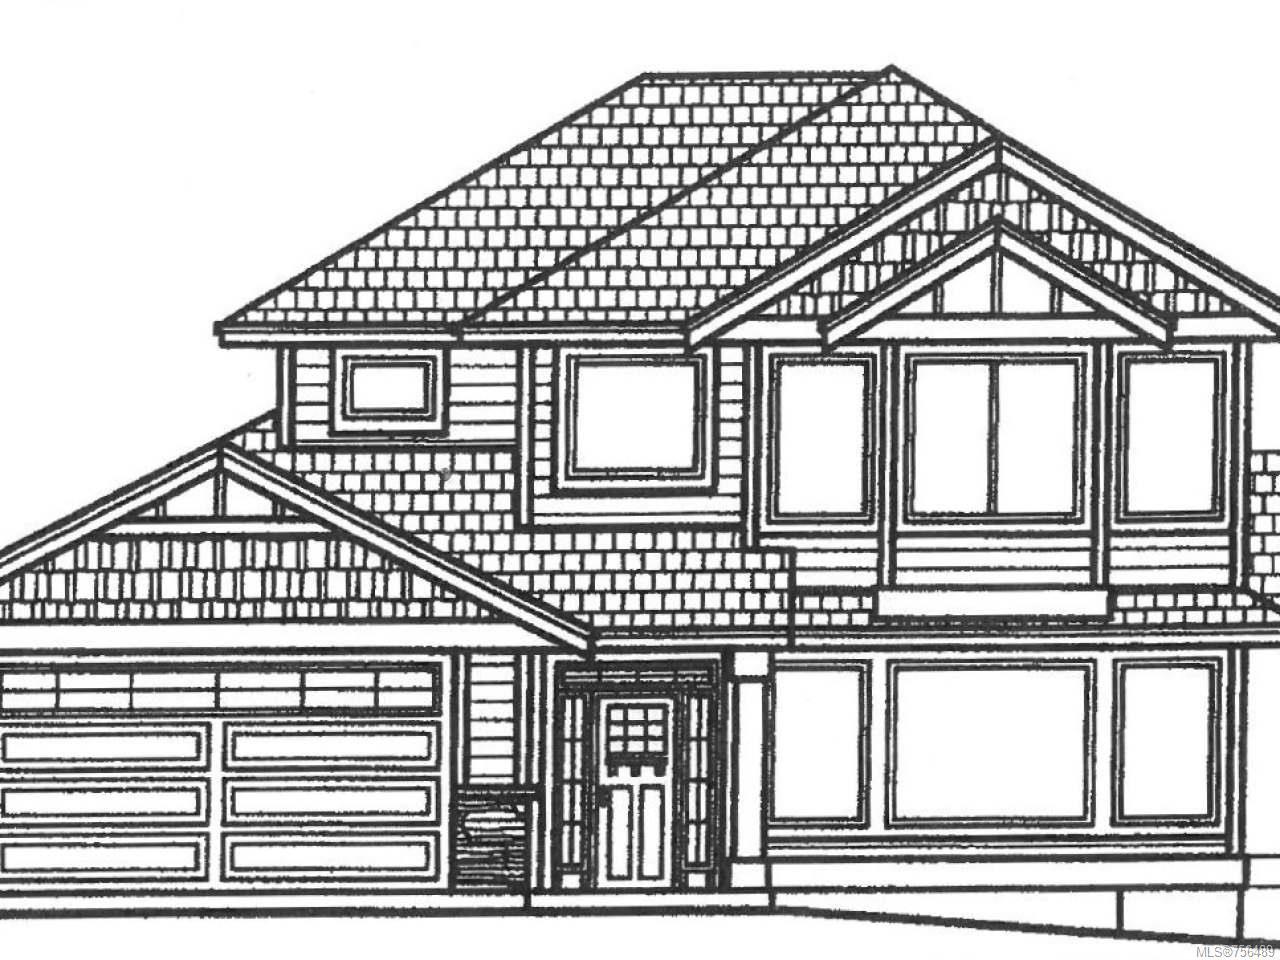 Main Photo: 2869 SWANSON STREET in COURTENAY: CV Courtenay City House for sale (Comox Valley)  : MLS®# 756489